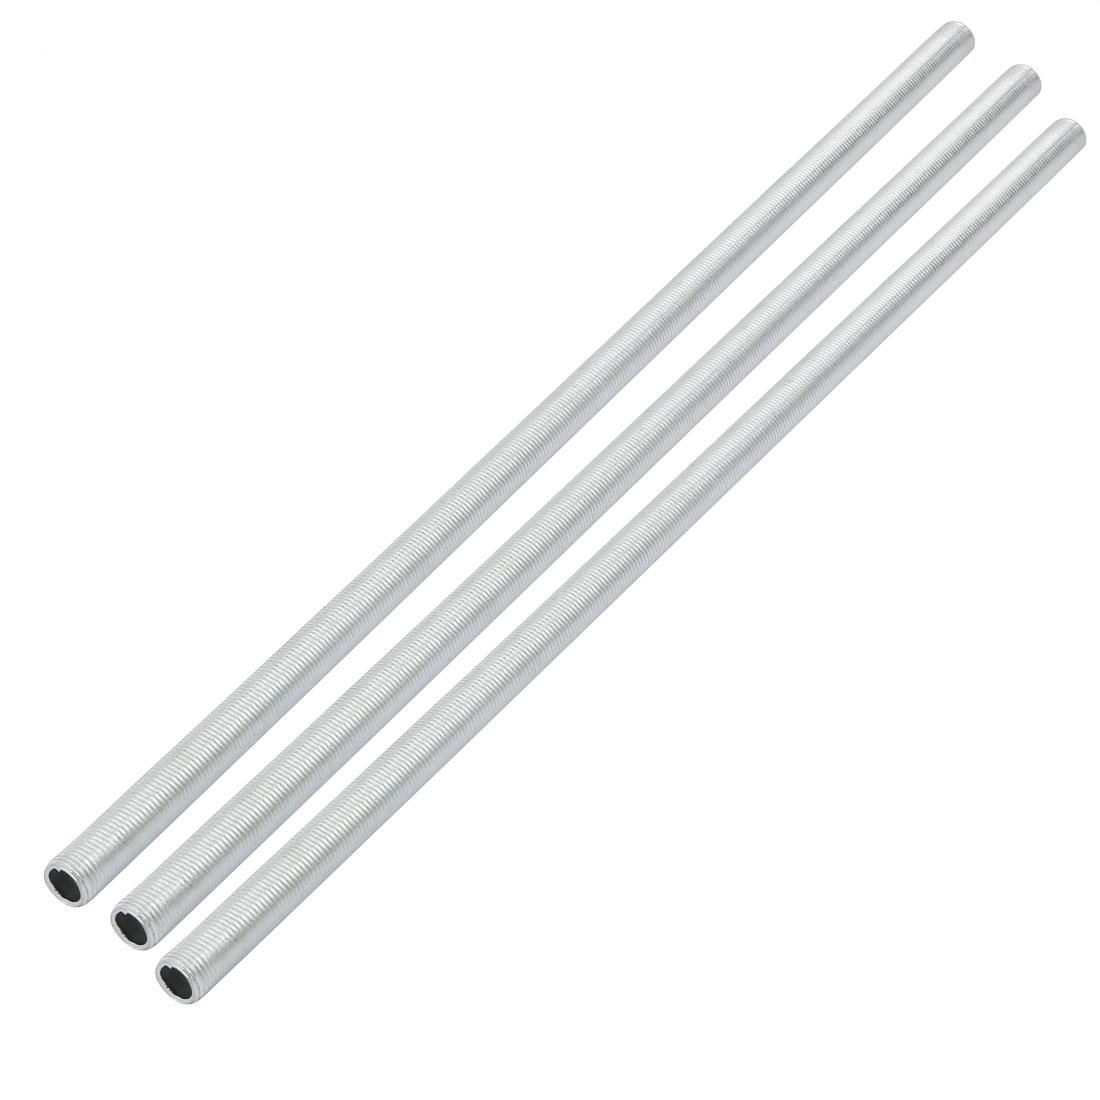 3pcs Metric M10 1mm Pitch Thread Zinc Plated Pipe Nipple Lamp Parts 34cm Long